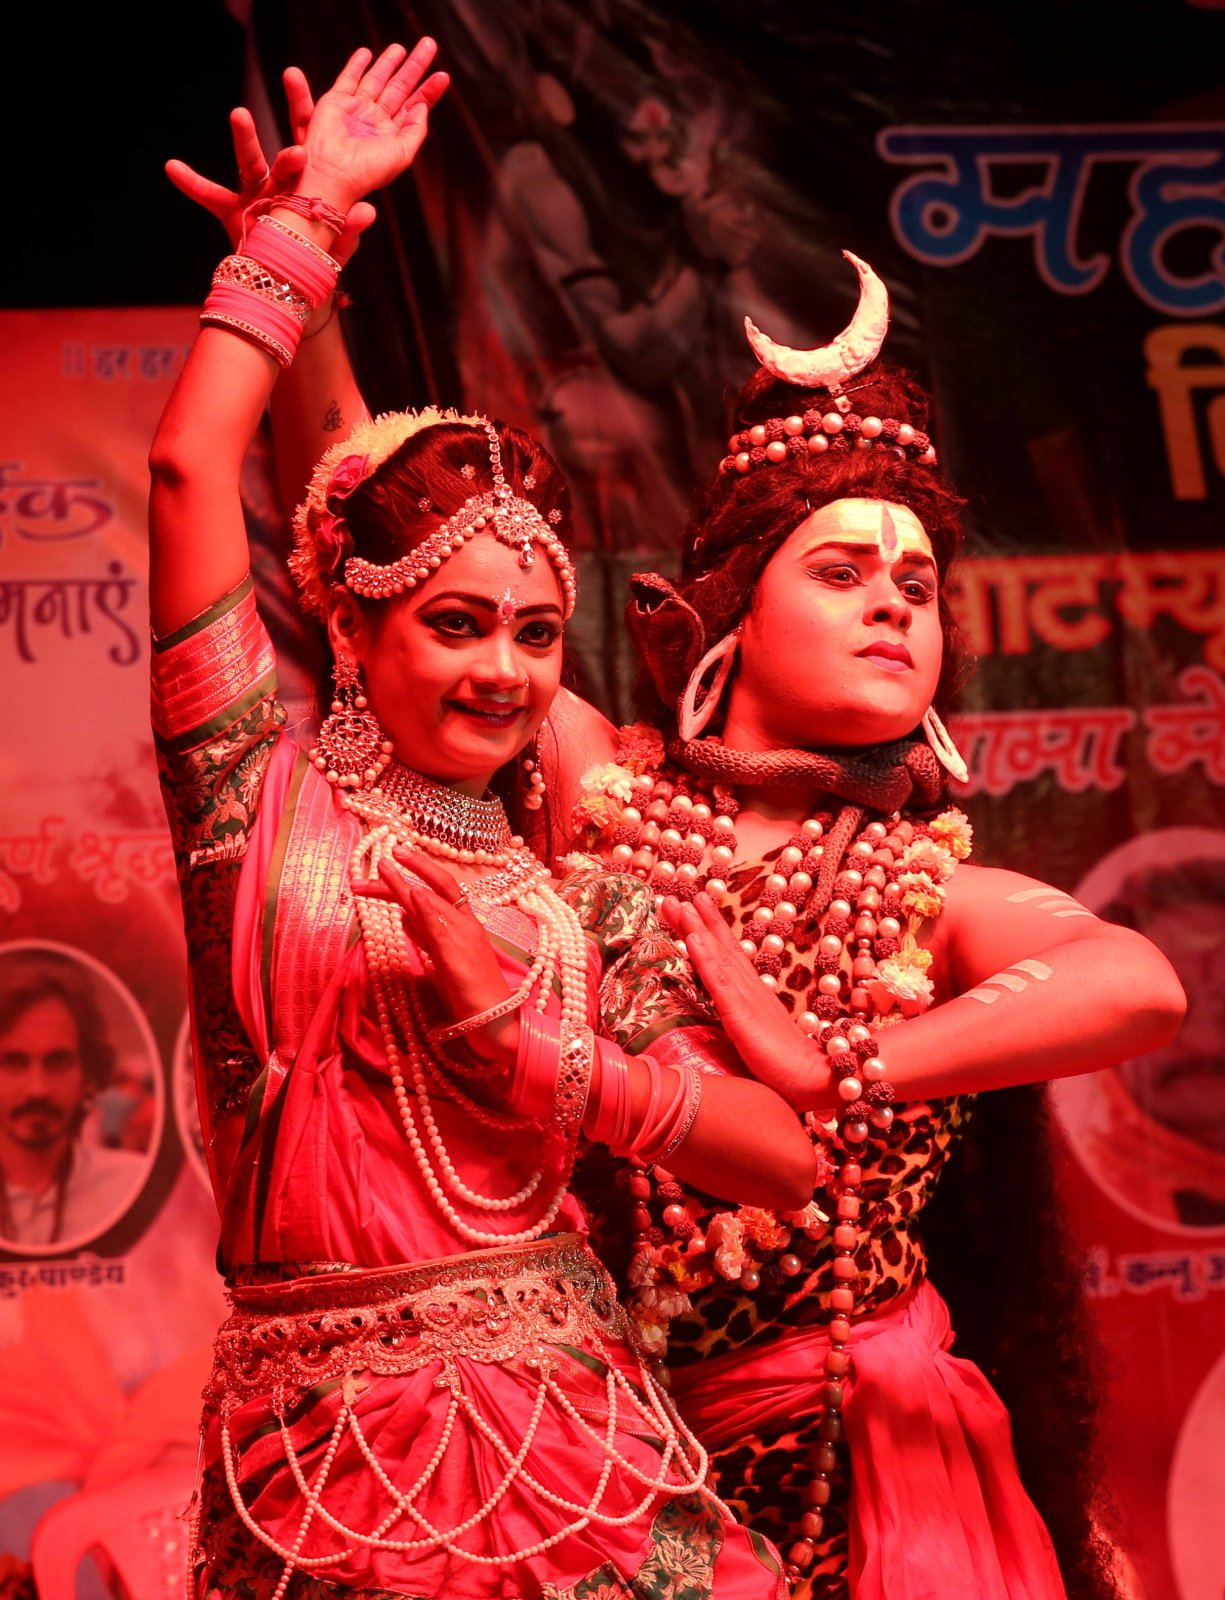 Festiwal SHIVRATRI w Indiach fot. EPA/SANJEEV GUPTA